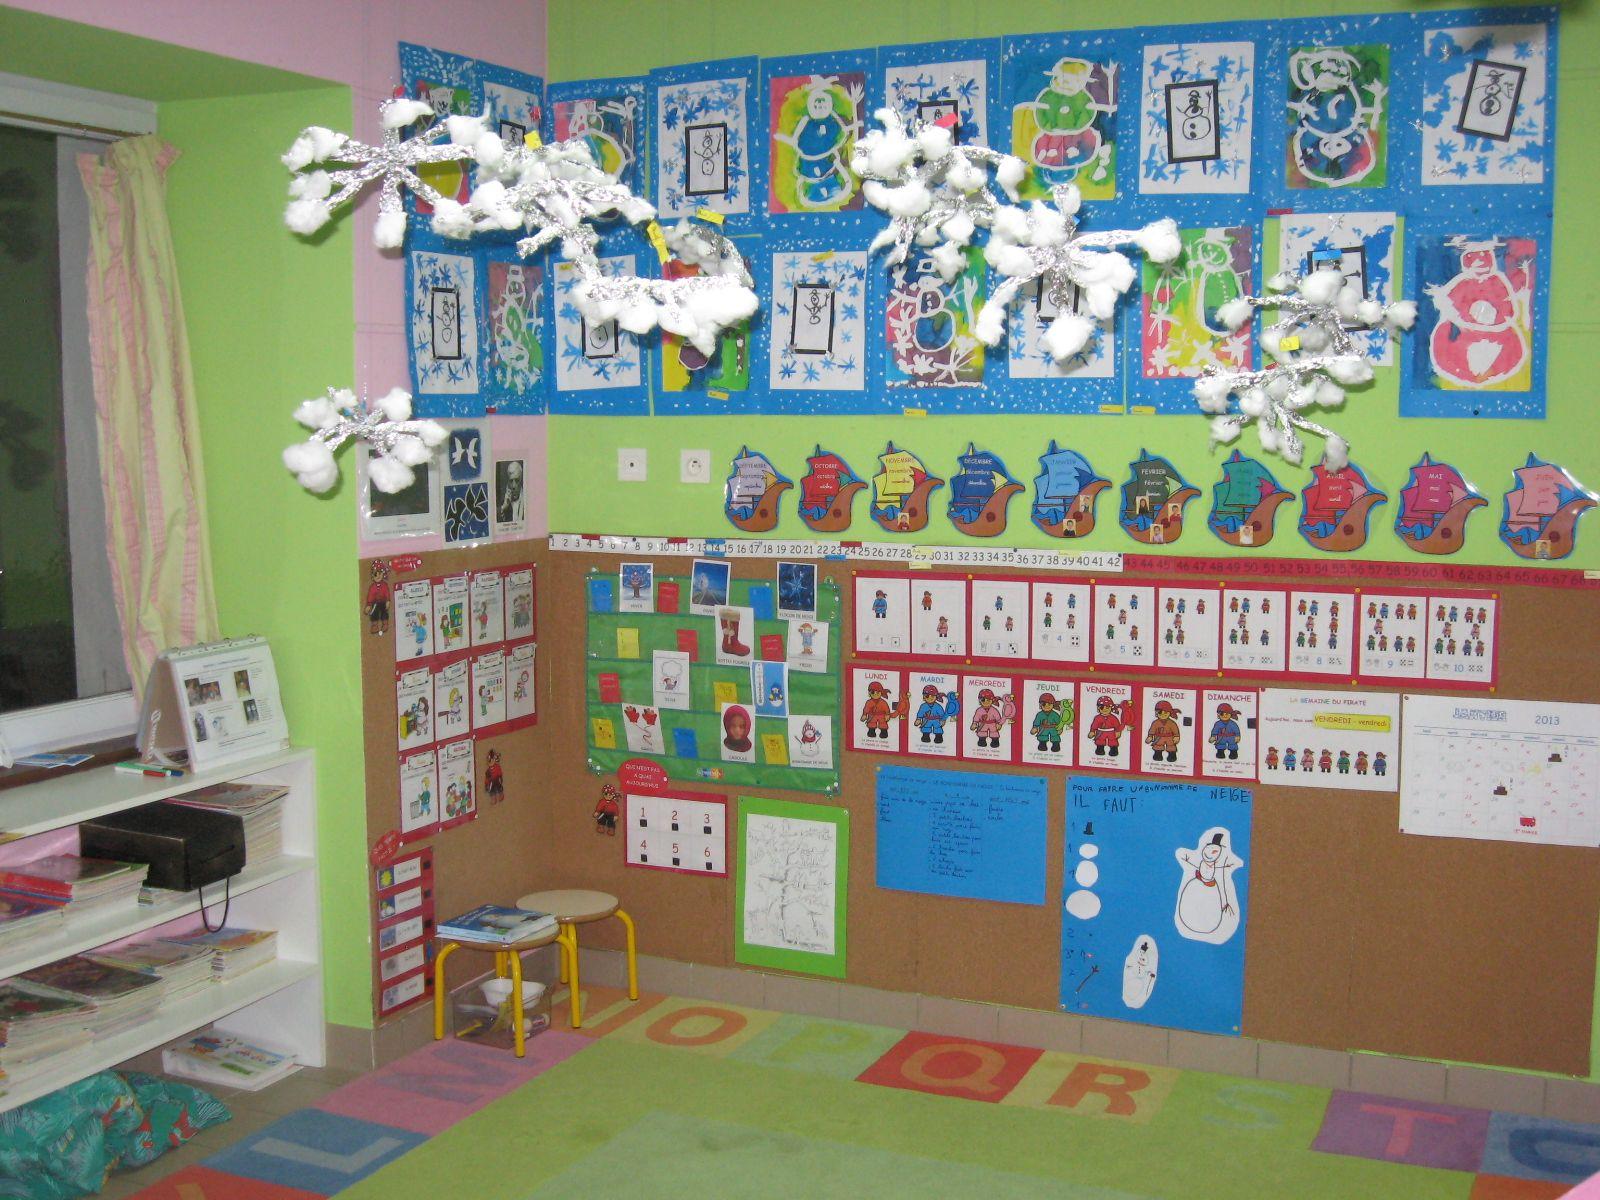 7 Inspiring Kid Room Color Options For Your Little Ones: Mon Coin De Regroupement Et Rituels